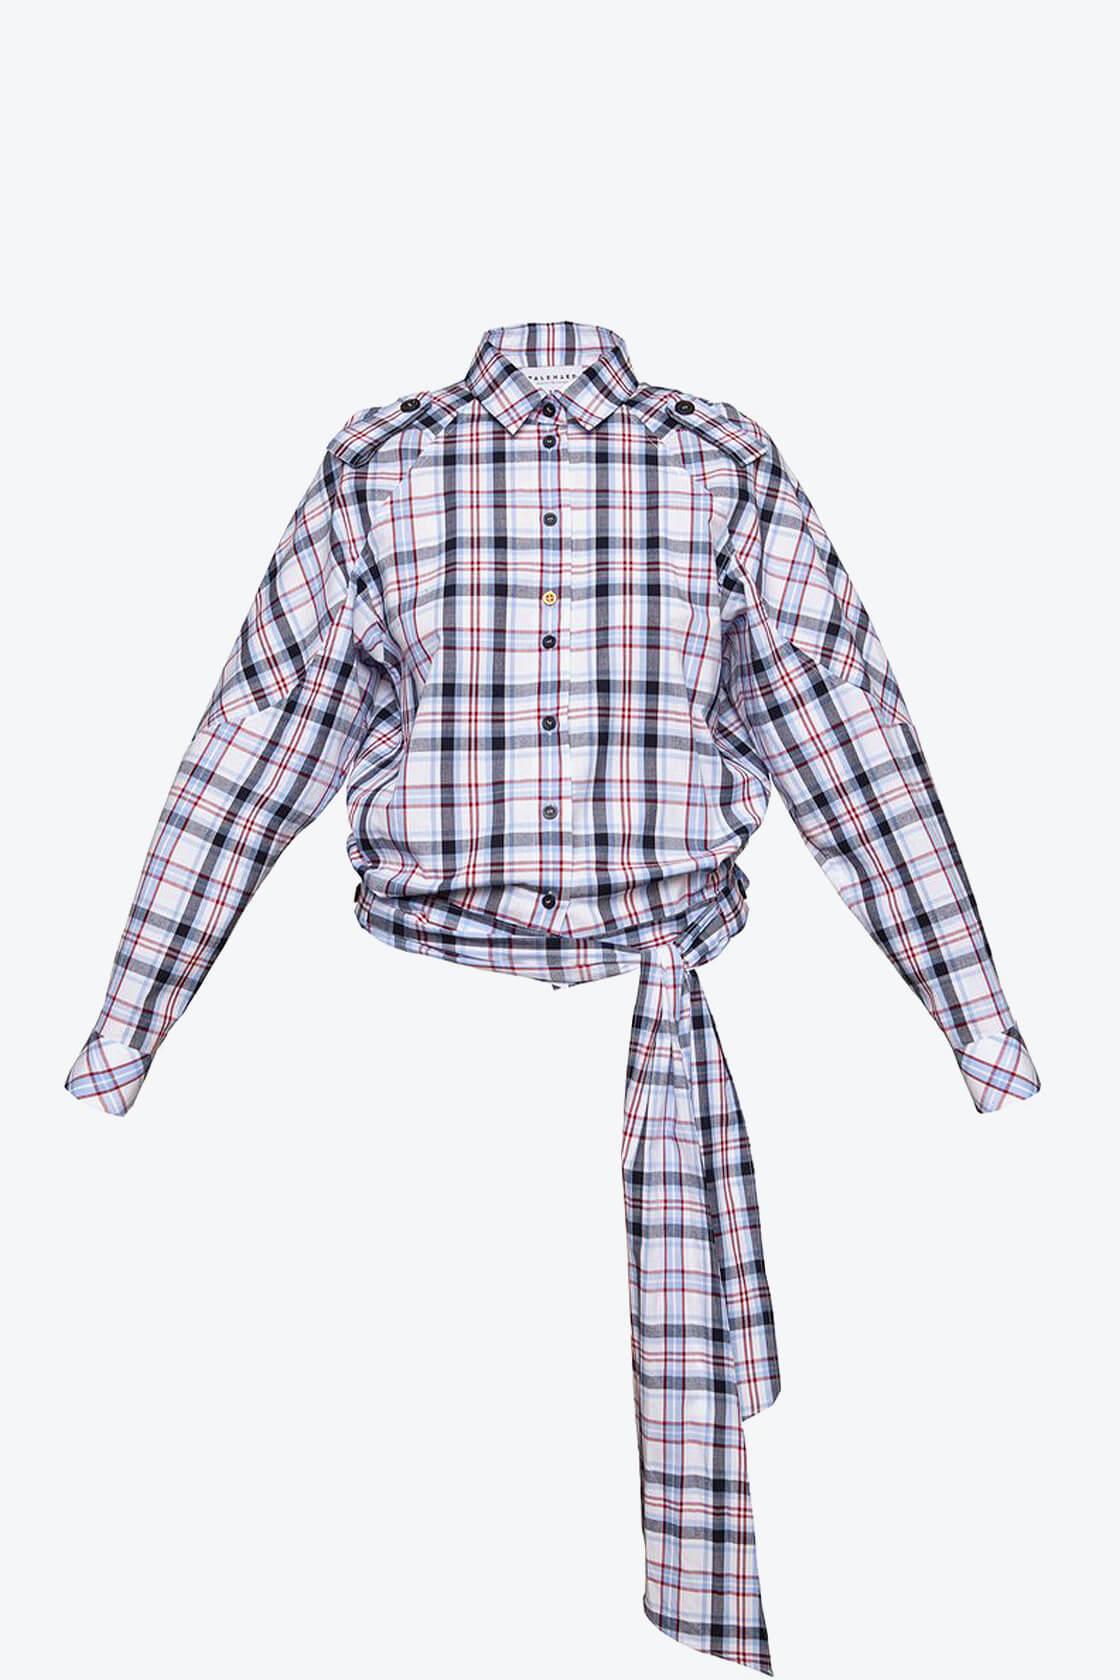 OL10000188 Low waist blouse plaid1